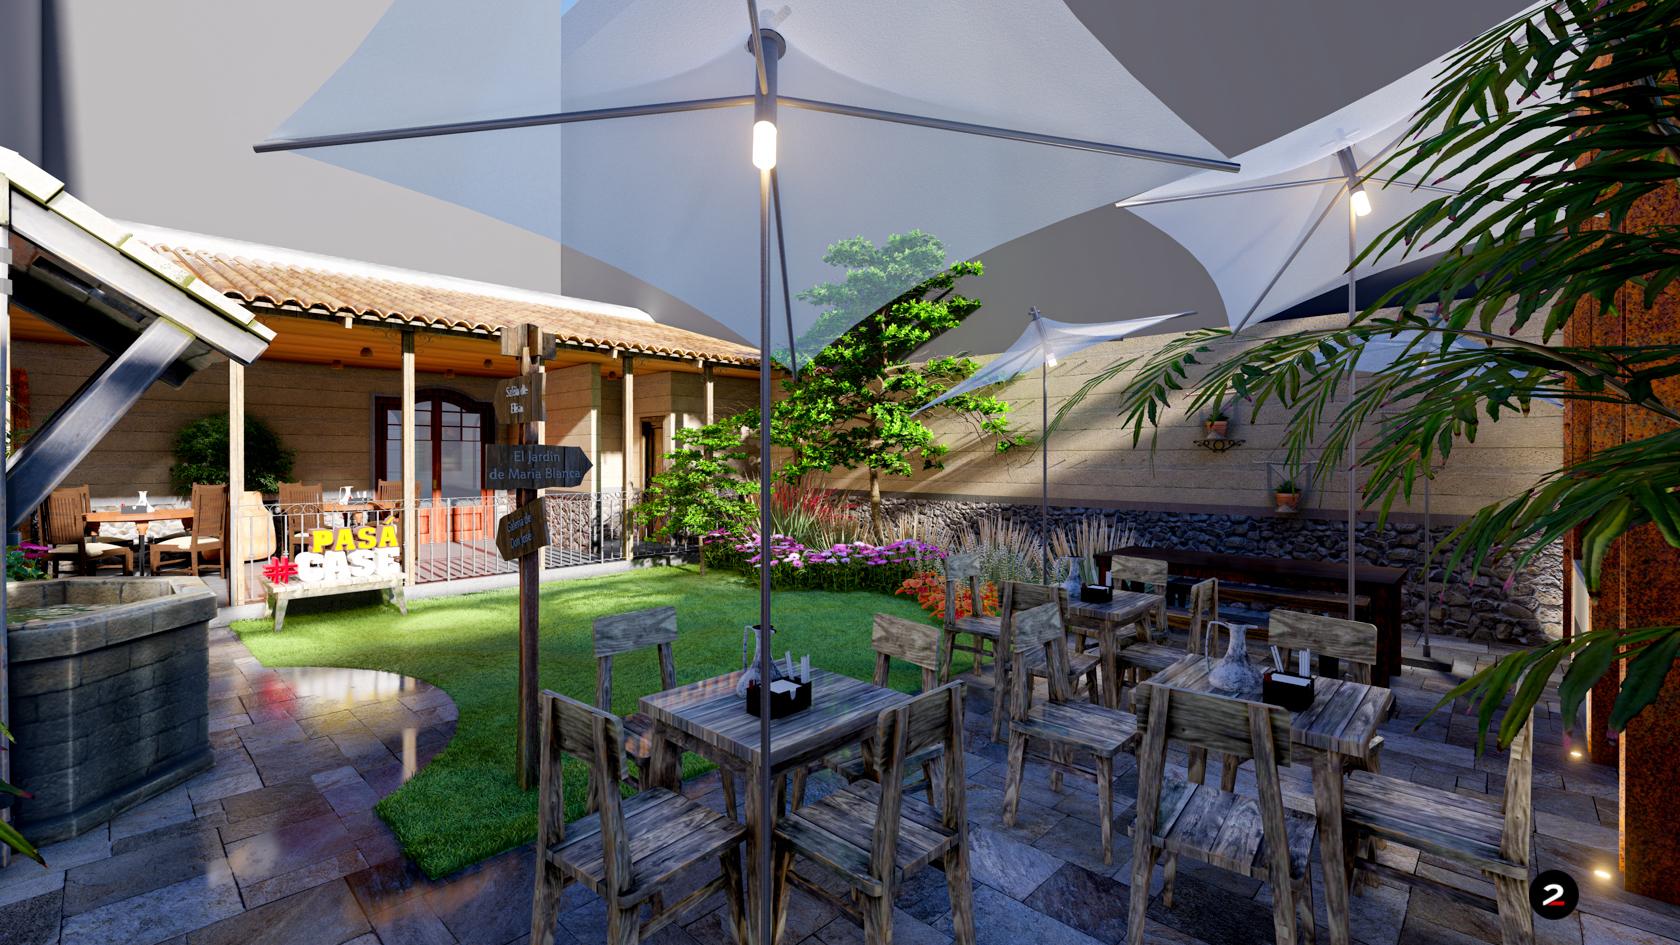 patio wistupiku 2lineas